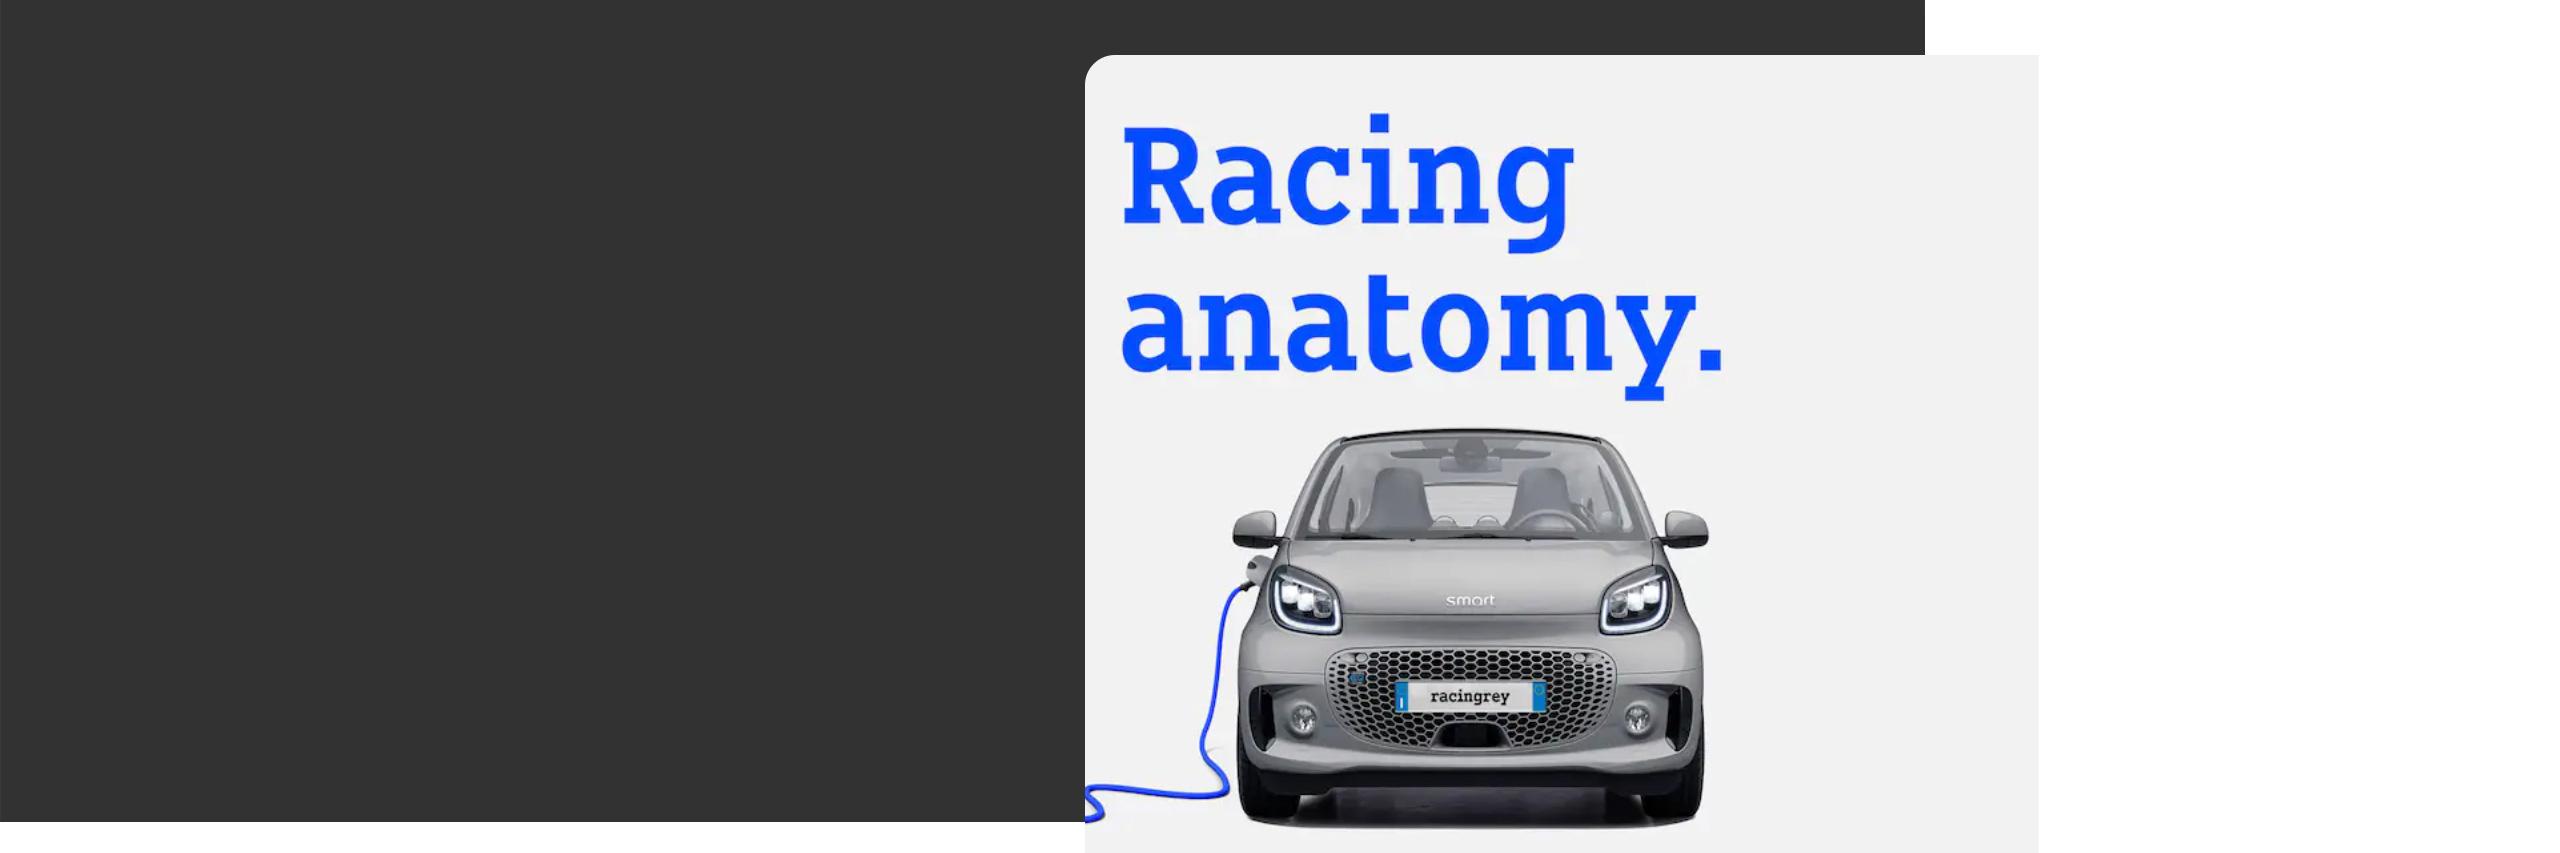 Nuova smart EQ fortwo racingrey.